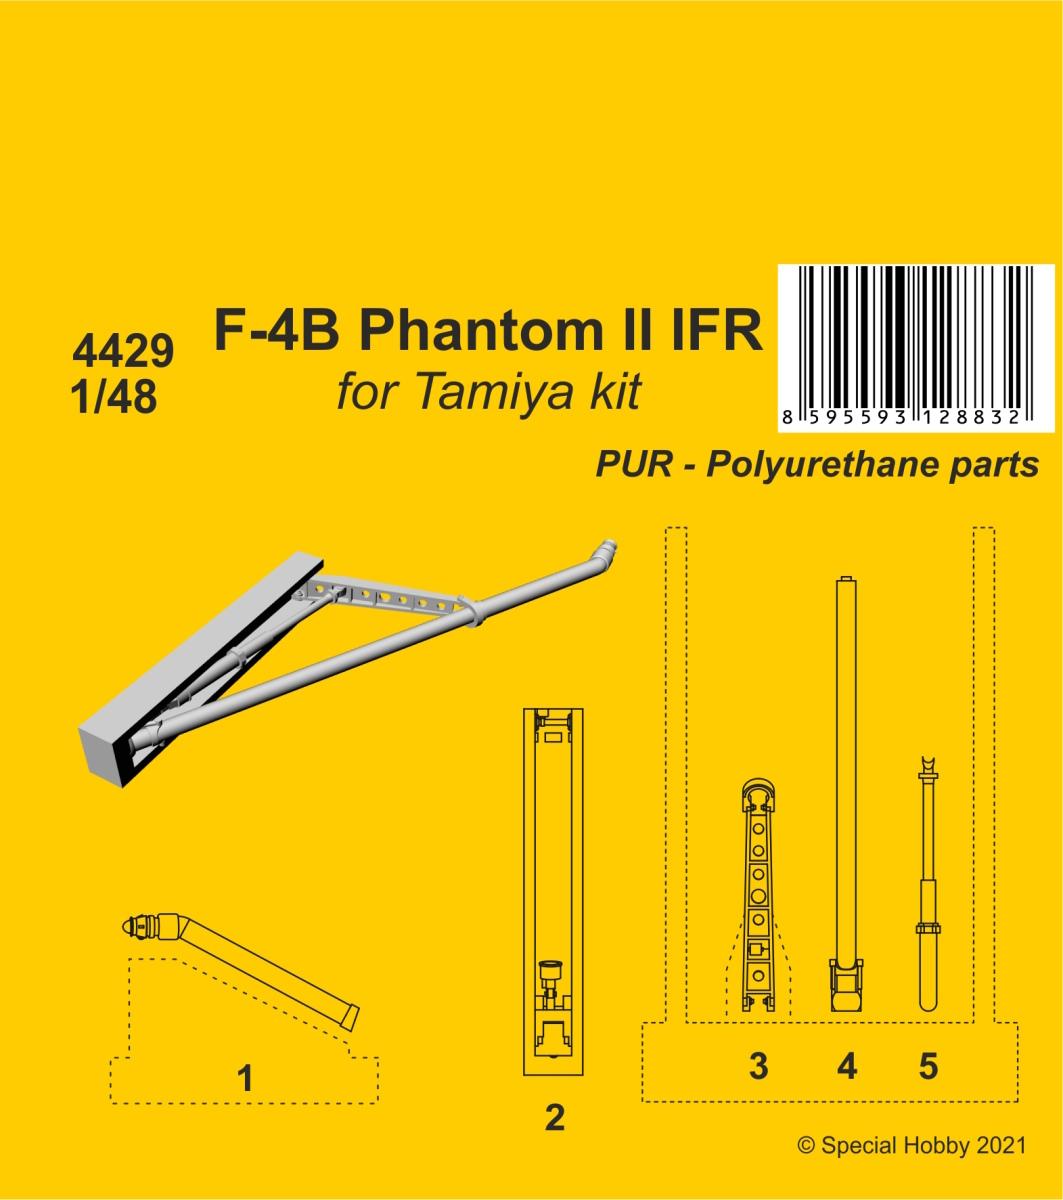 1/48 F-4B Phantom IFR (from Tamiya kit)